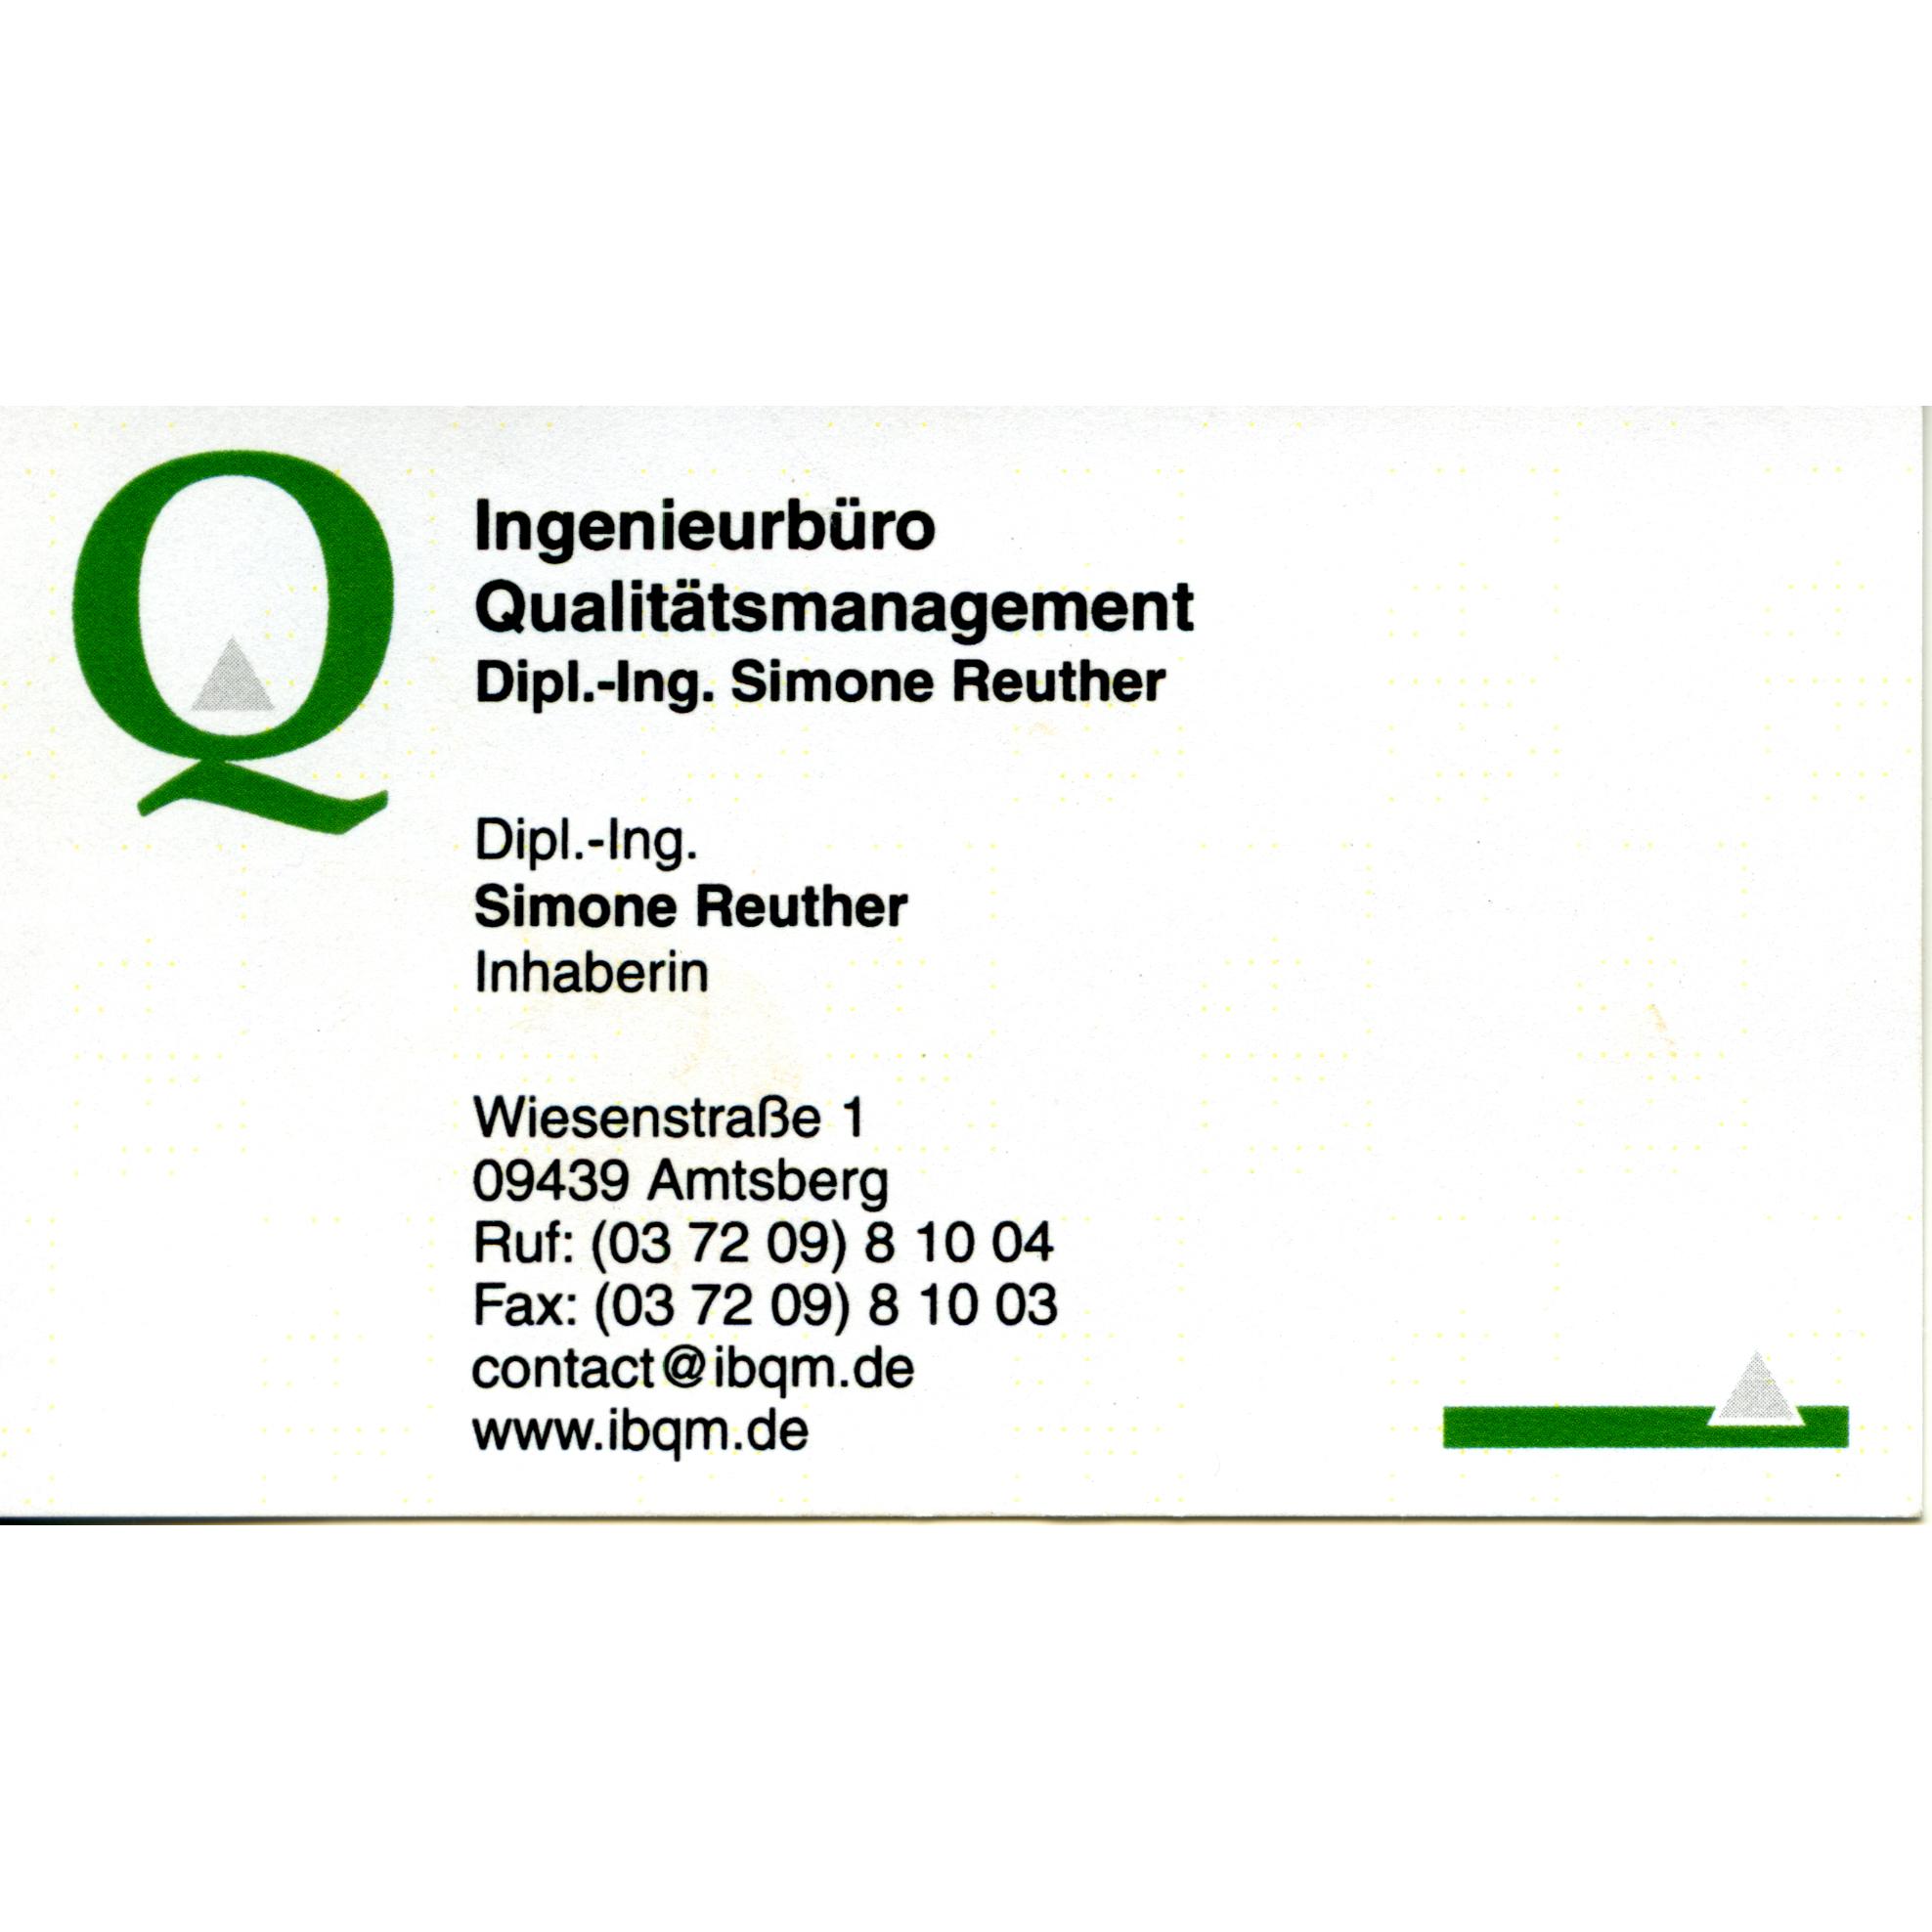 Ingenieurbüro Qualitätsmanagement Dipl.-Ing. Simone Reuther